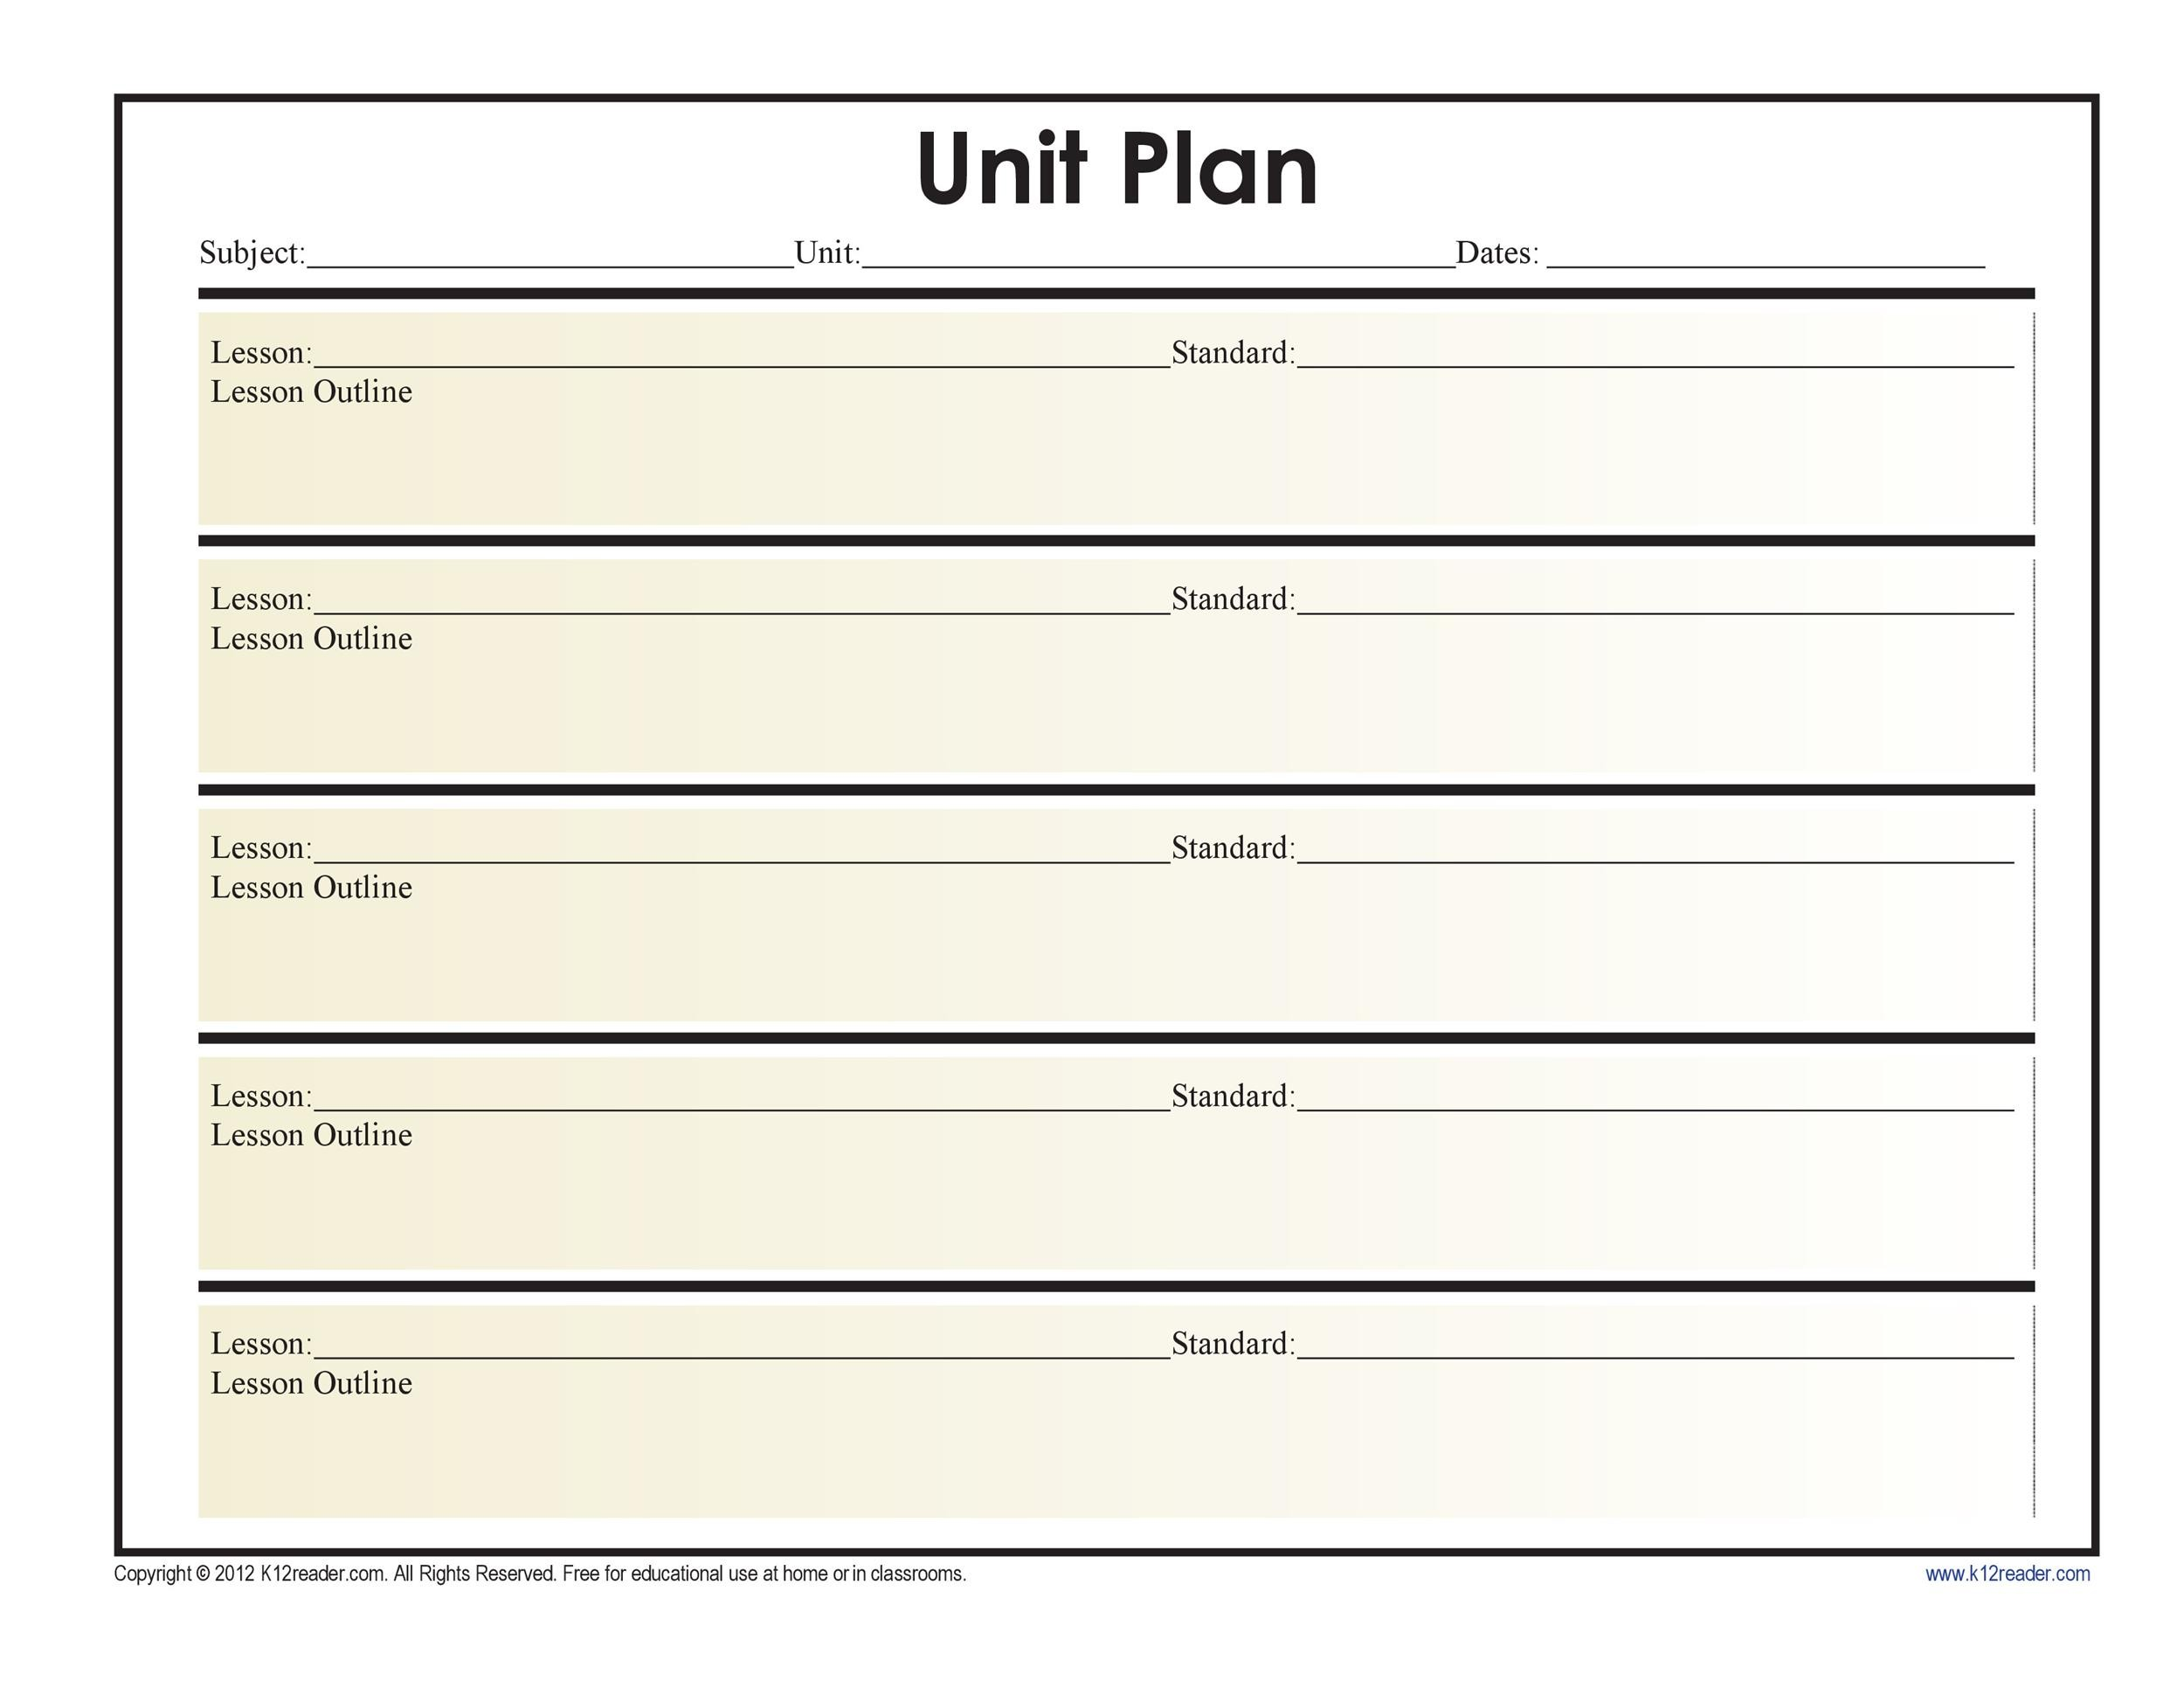 Free unit plan template 14